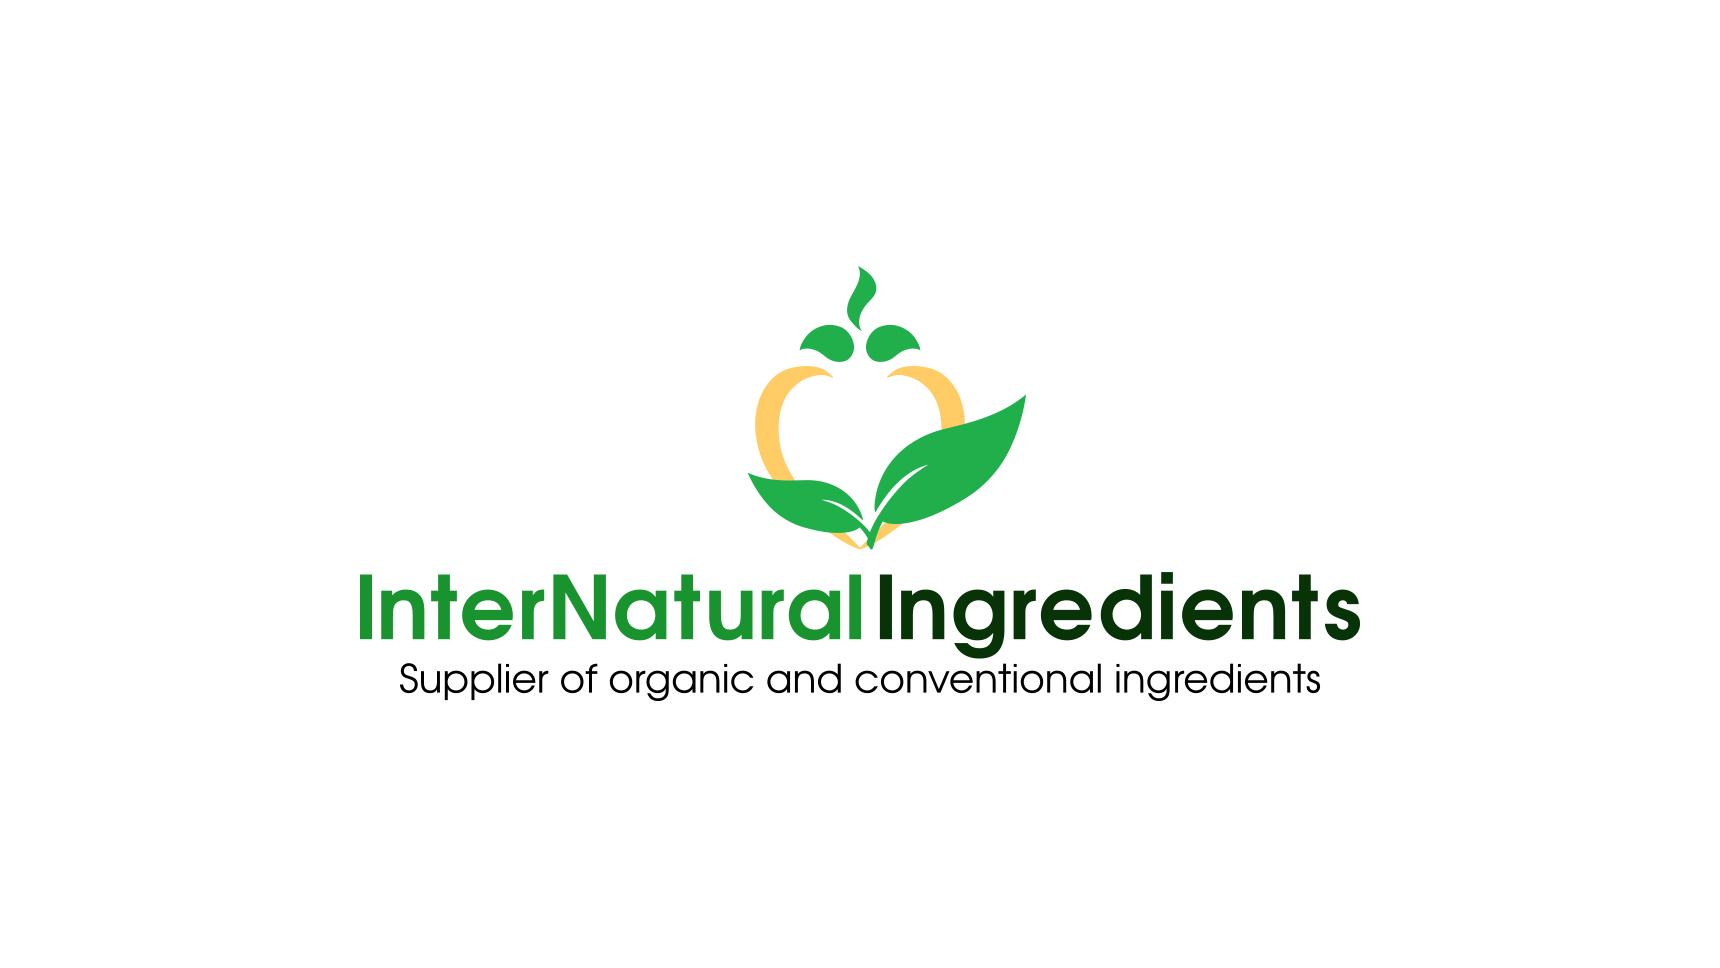 Internatural Ingredients